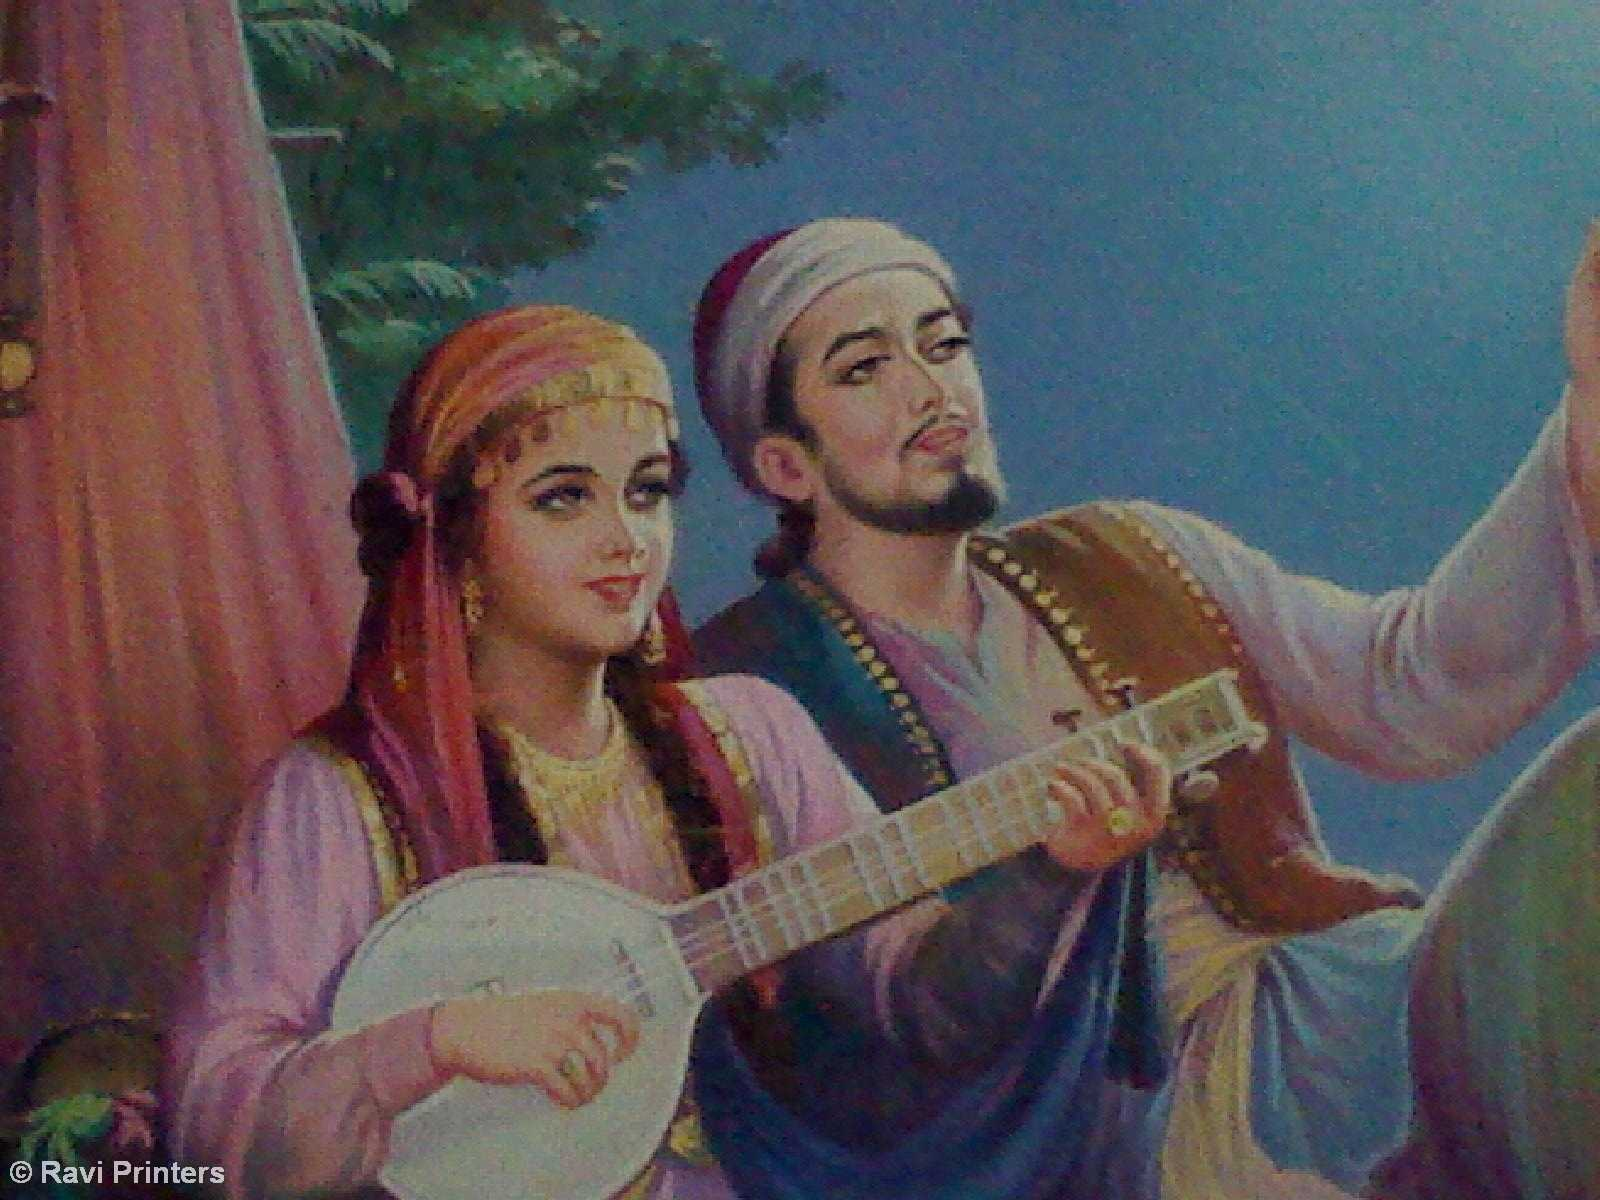 Ютуб музыка узбекская классика, Узбекская классическая музыка video 27 фотография